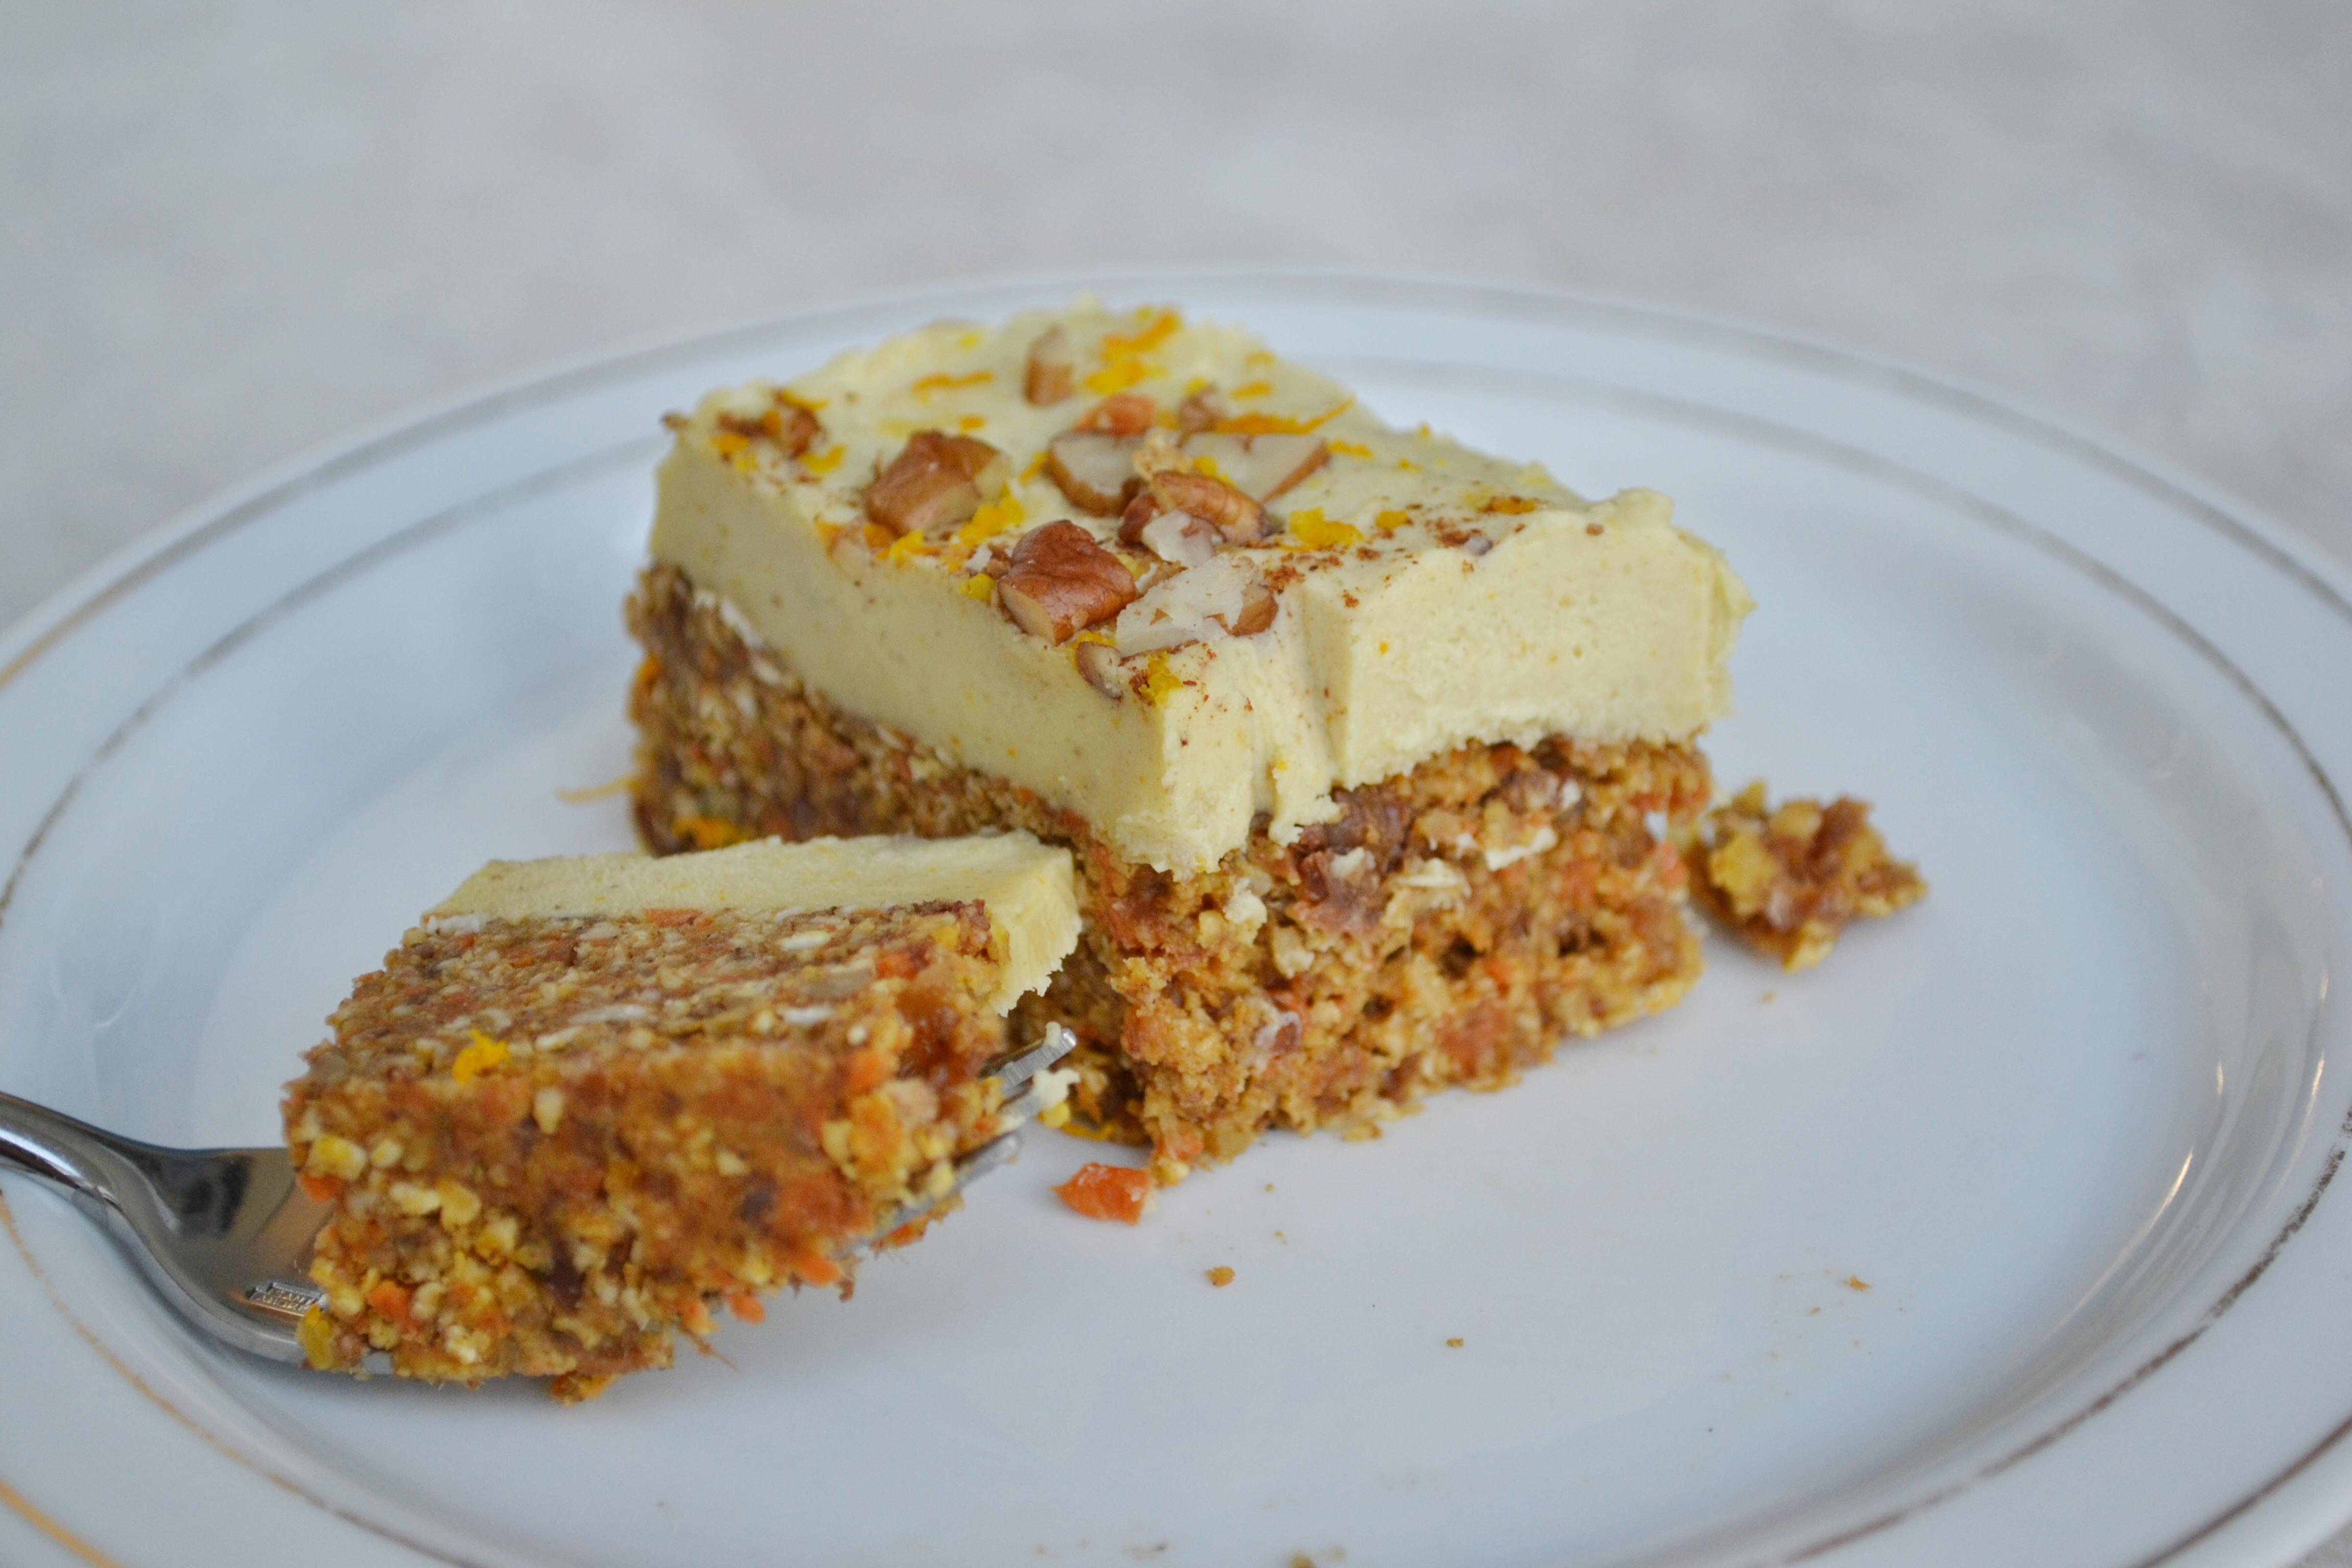 Healthy Vegan Carrot Cake  Healthy Carrot Cake HealthyJon